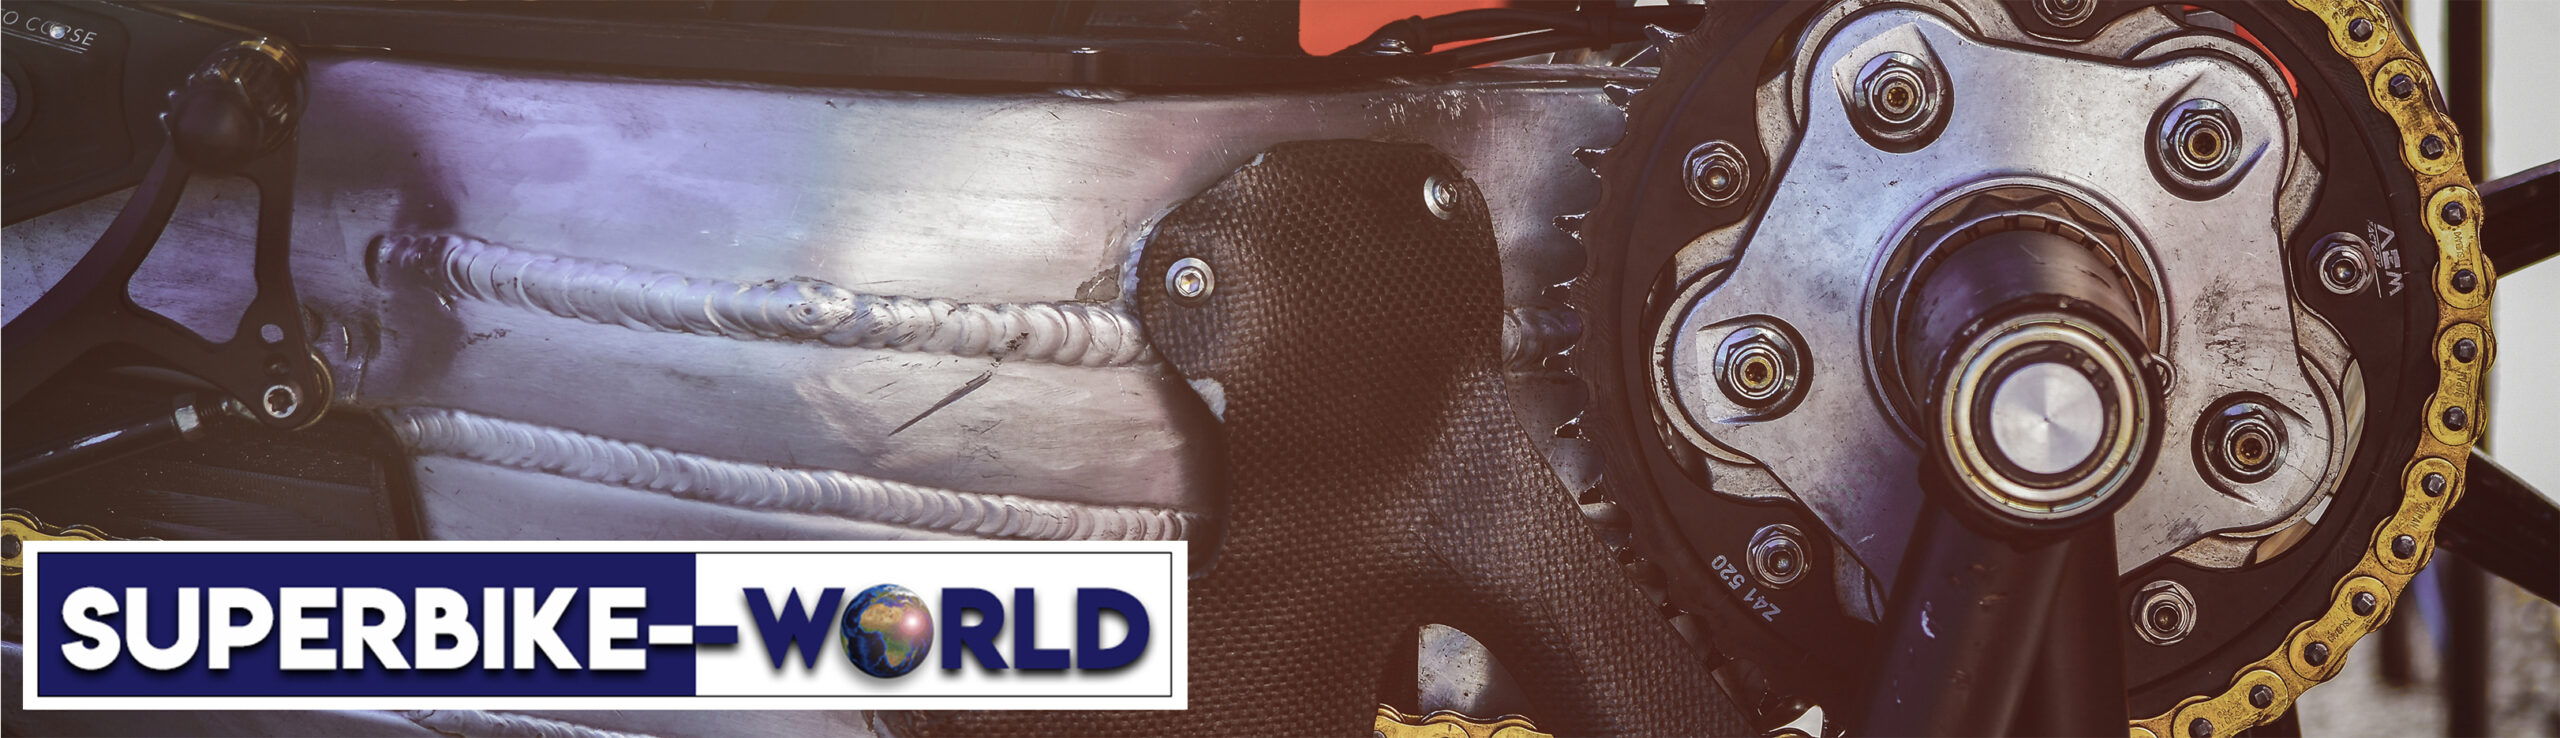 Superbike-World